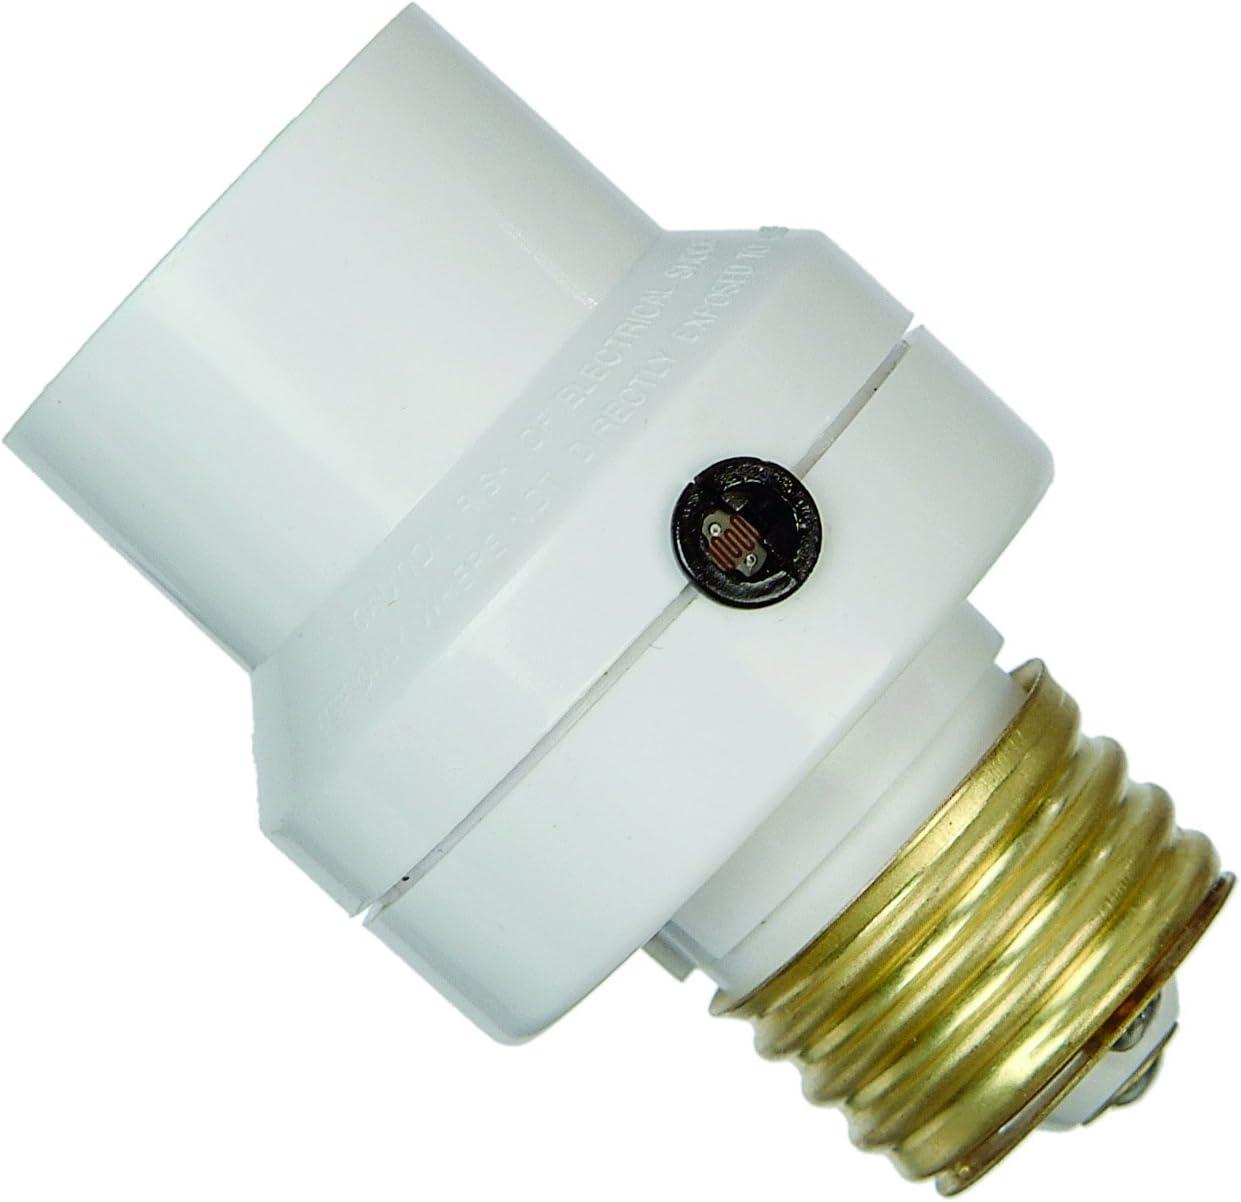 Programmable Outdoor Lights Automatic On Off Control Motion Sensor Retrofit Kit